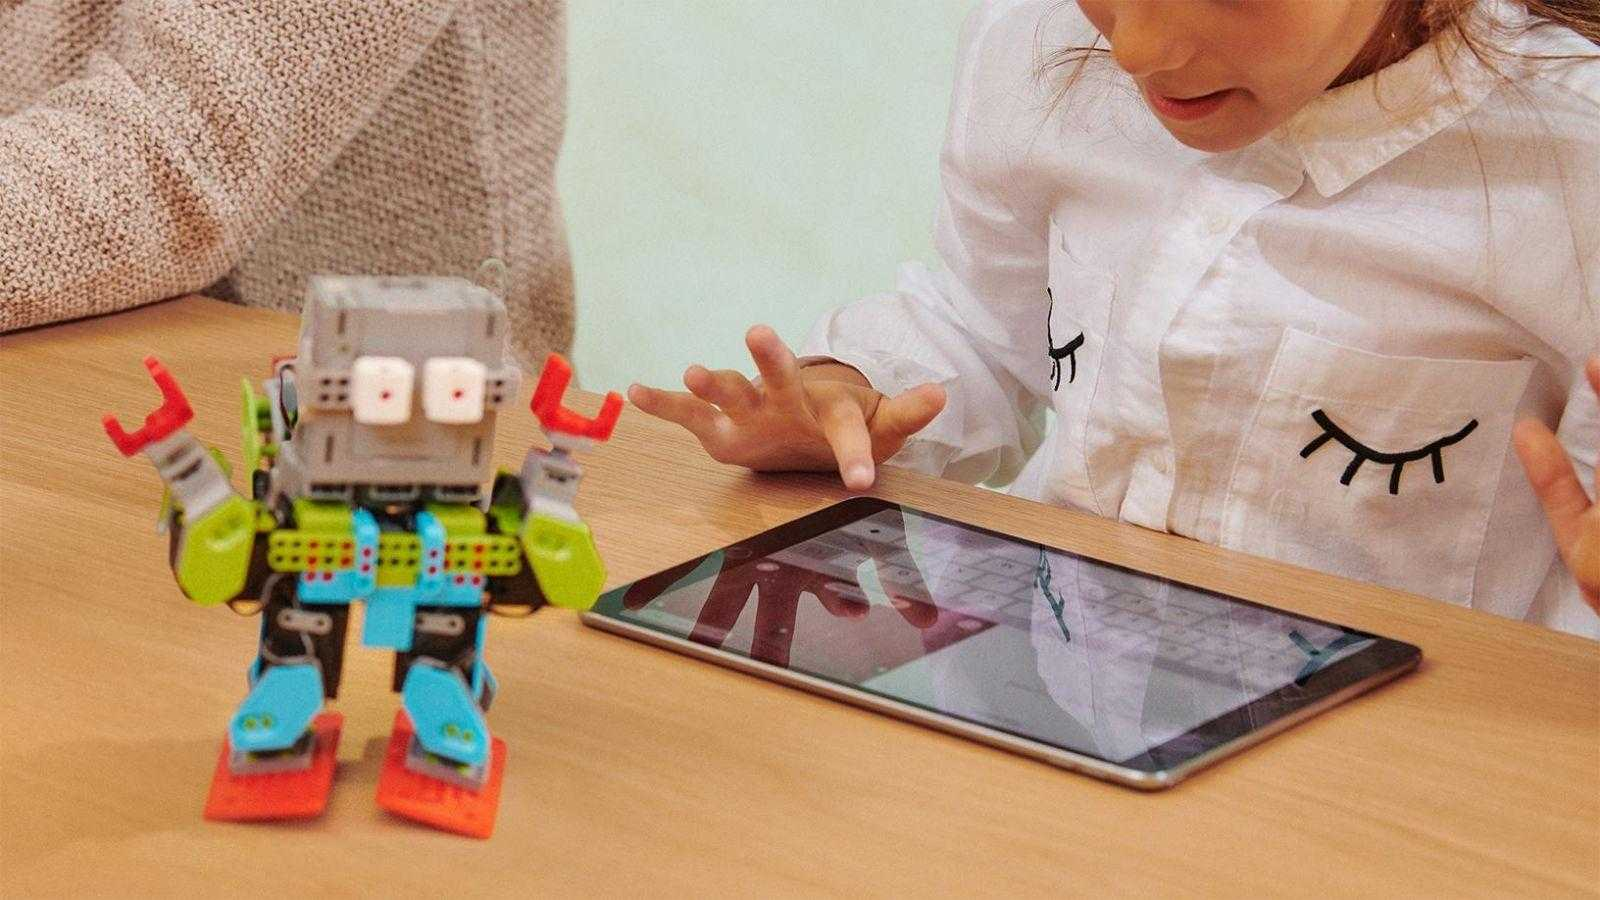 Apple отмечает 8 марта, рассказывая о достижениях женщин (apple honors female coders girl with ipad)